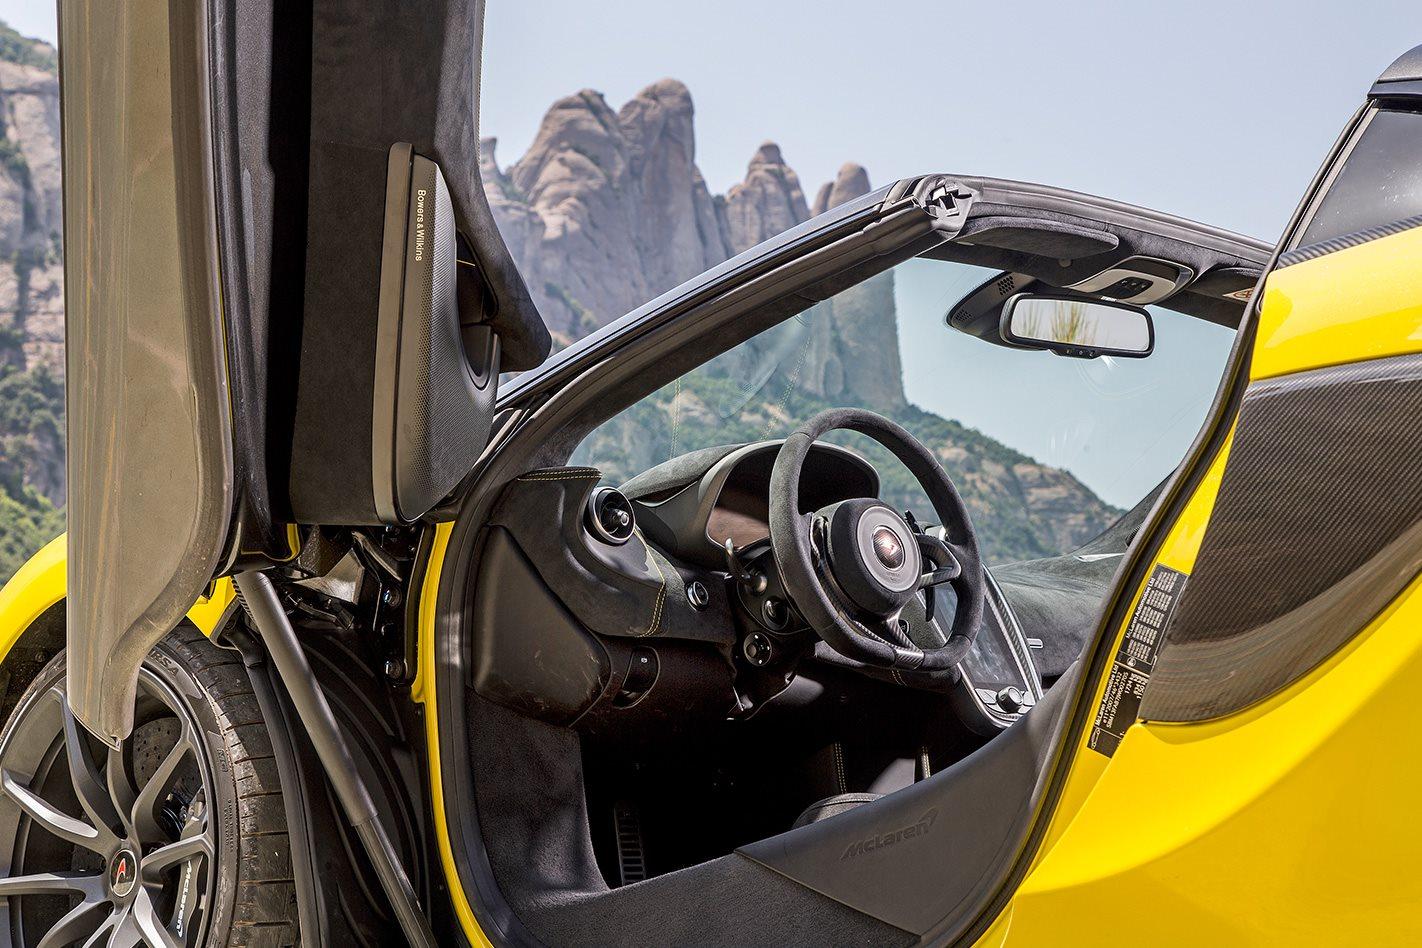 2017 McLaren 570S Spider cabin